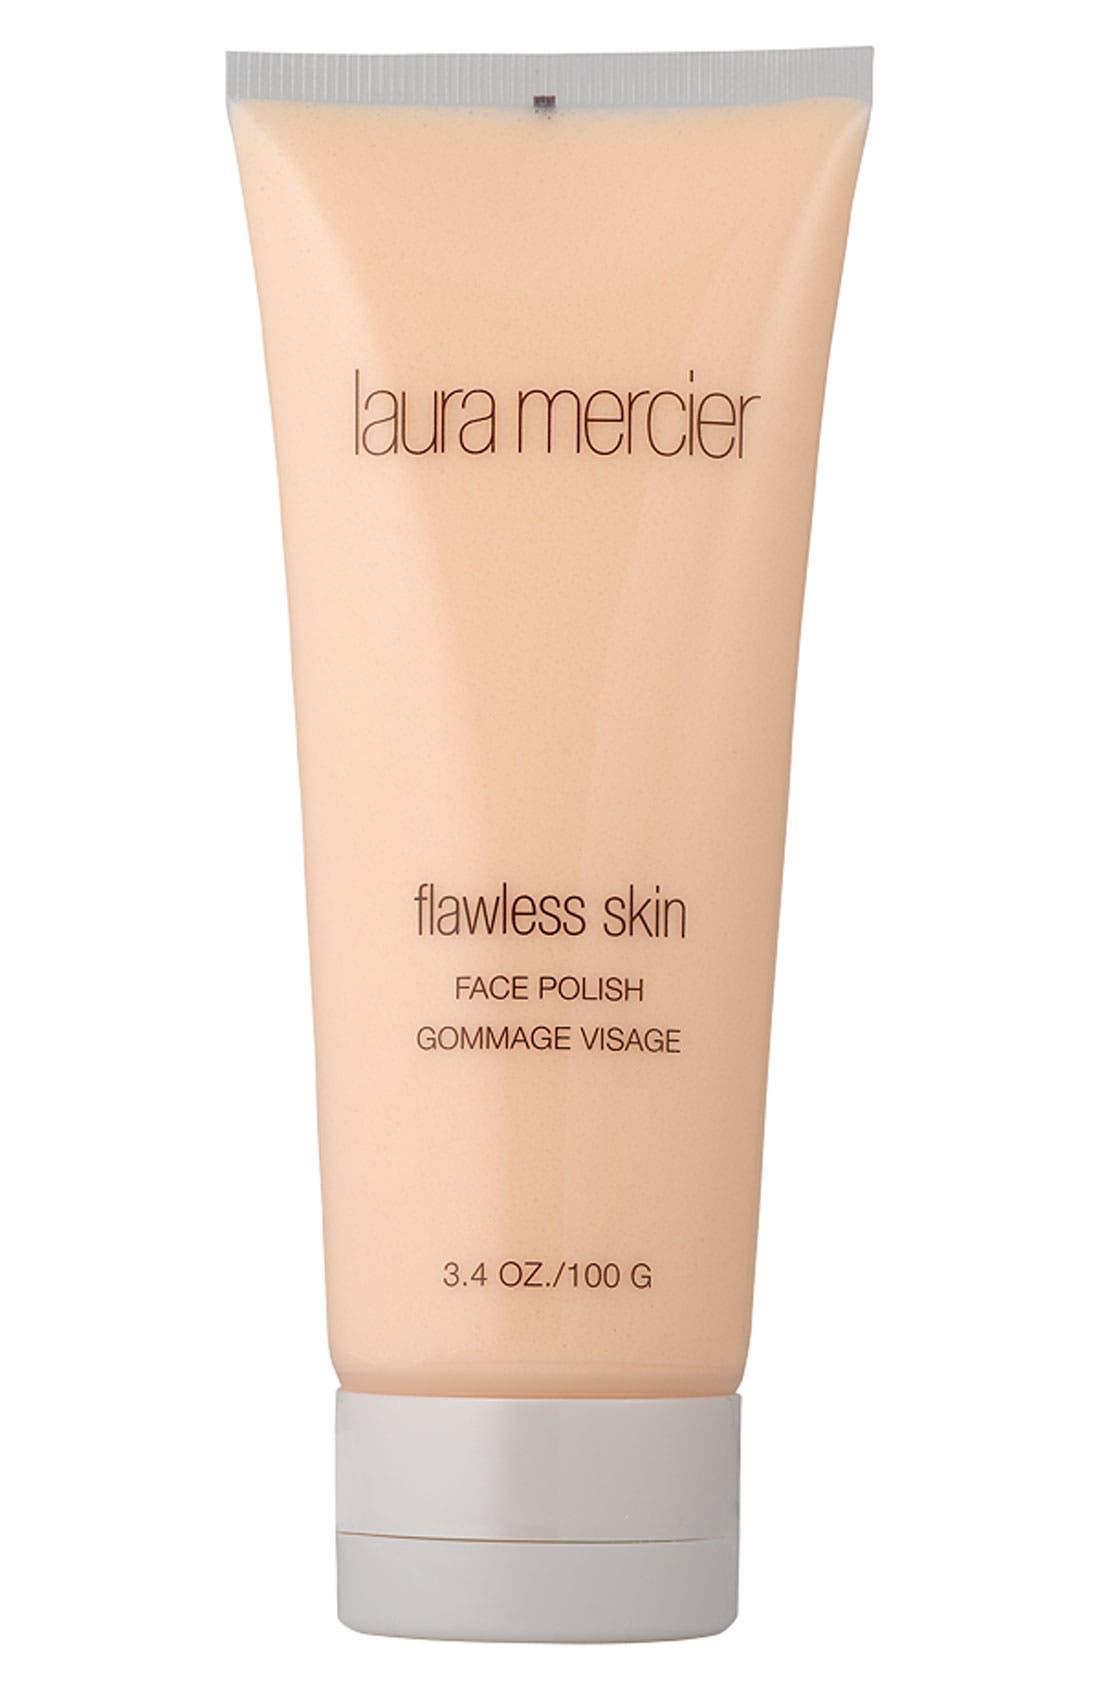 LAURA MERCIER 'Flawless Skin' Face Polish, Main, color, NO COLOR